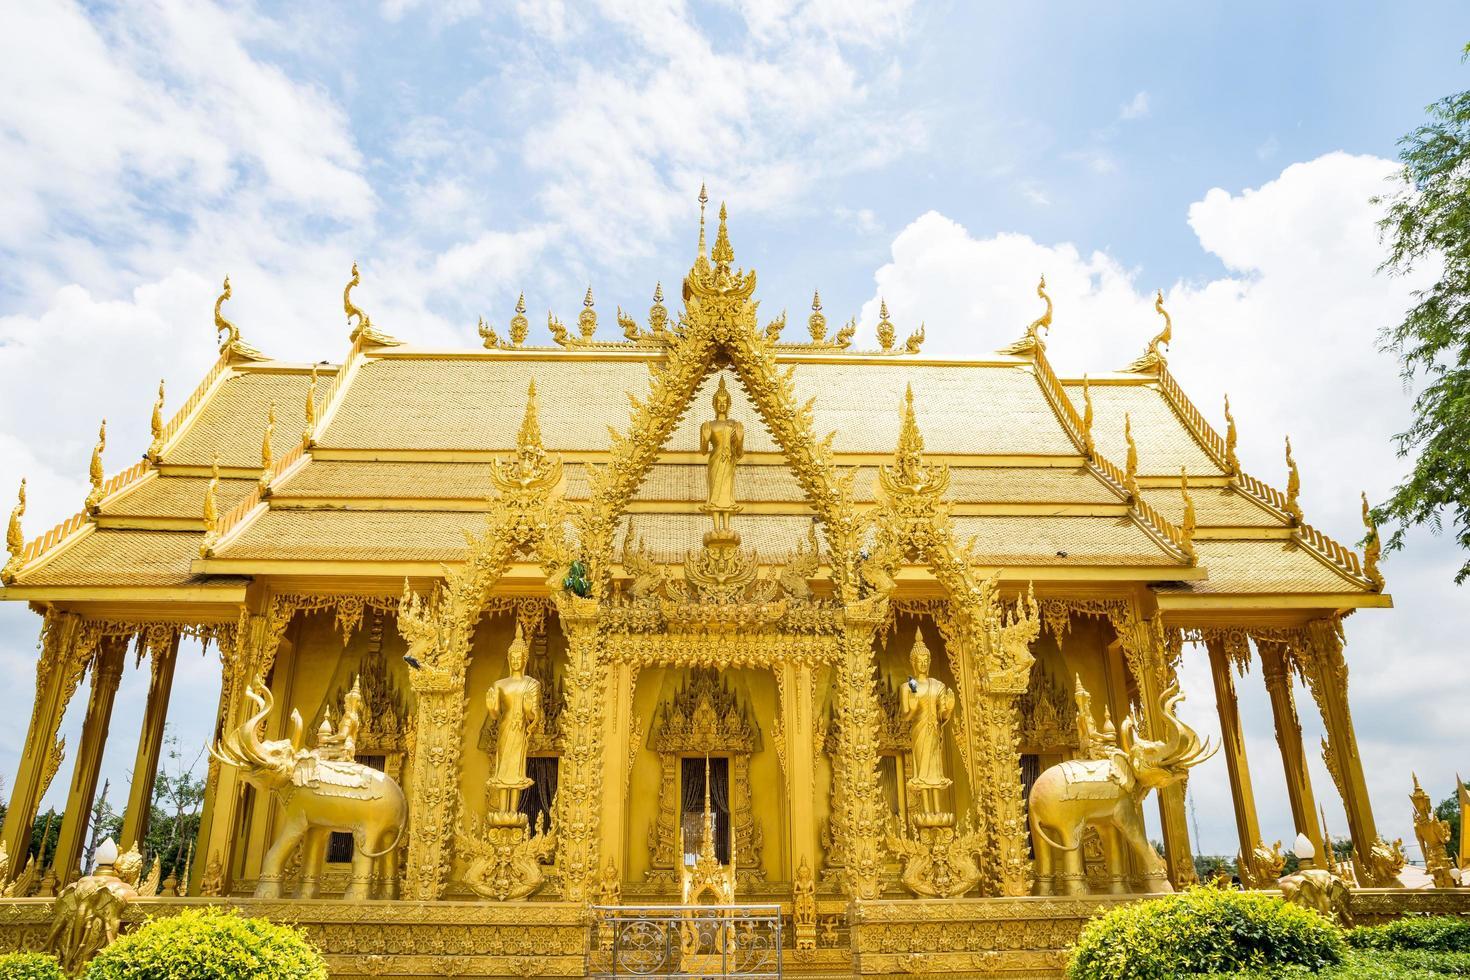 de gouden tempel van wat paknam jolo, thailand foto